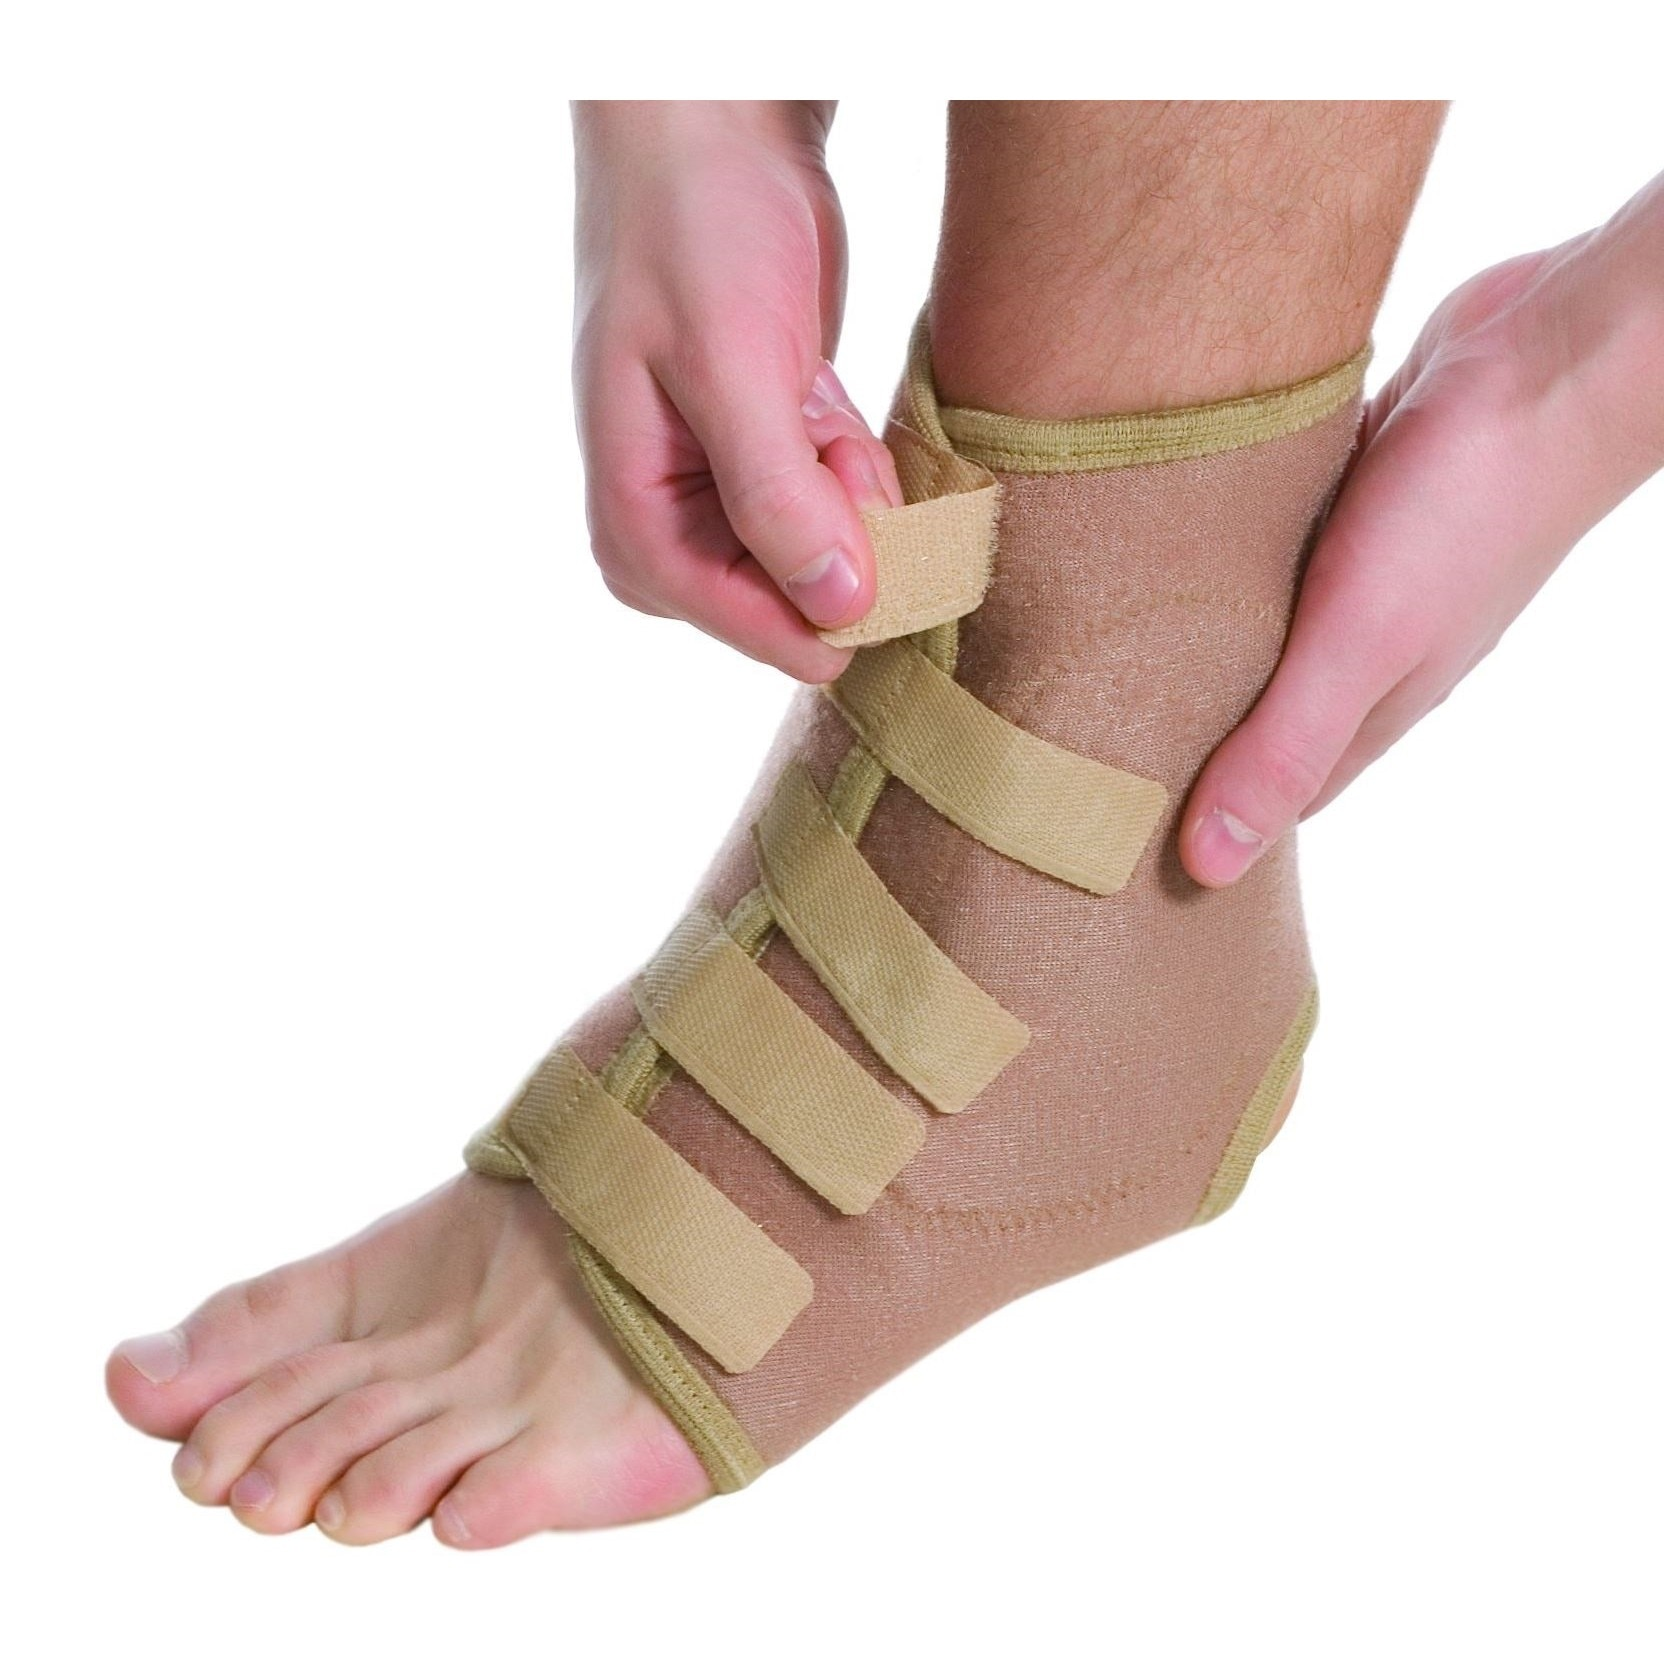 Cauzele doare articulația gleznei. Durerea de glezna – cauze si tratament | Consultatie Ortopedie